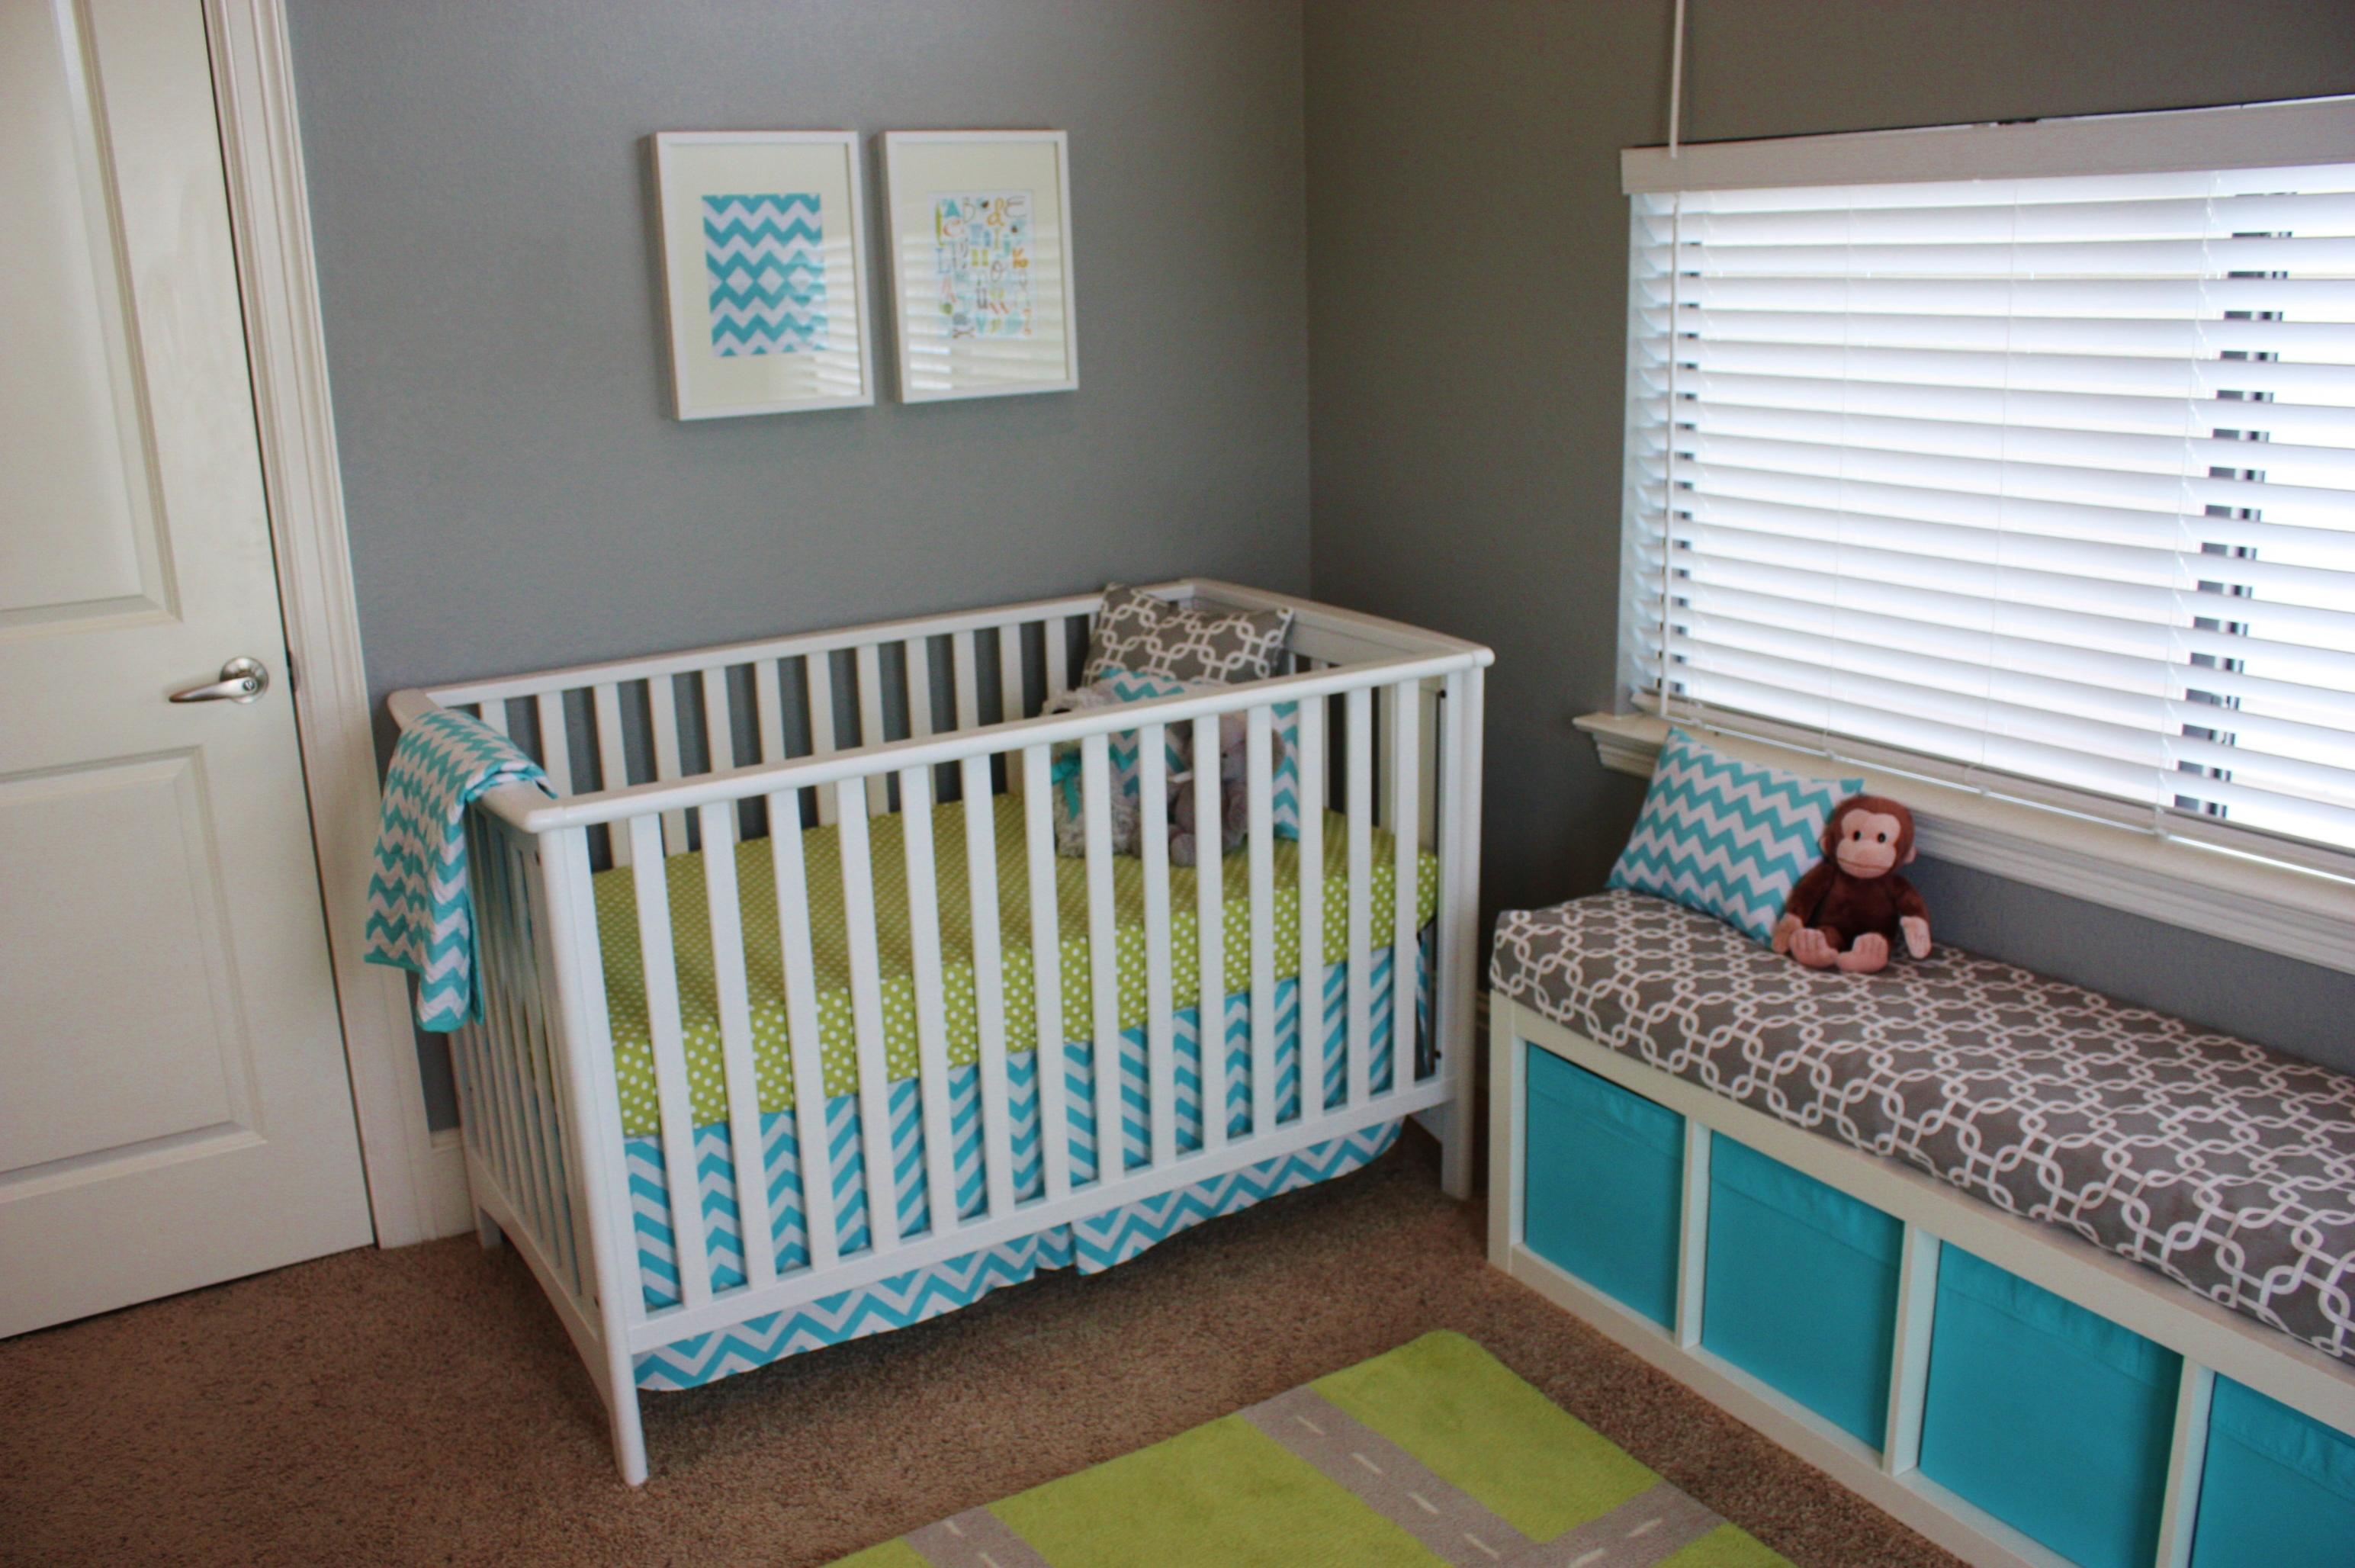 Monkey Decor For Baby Room